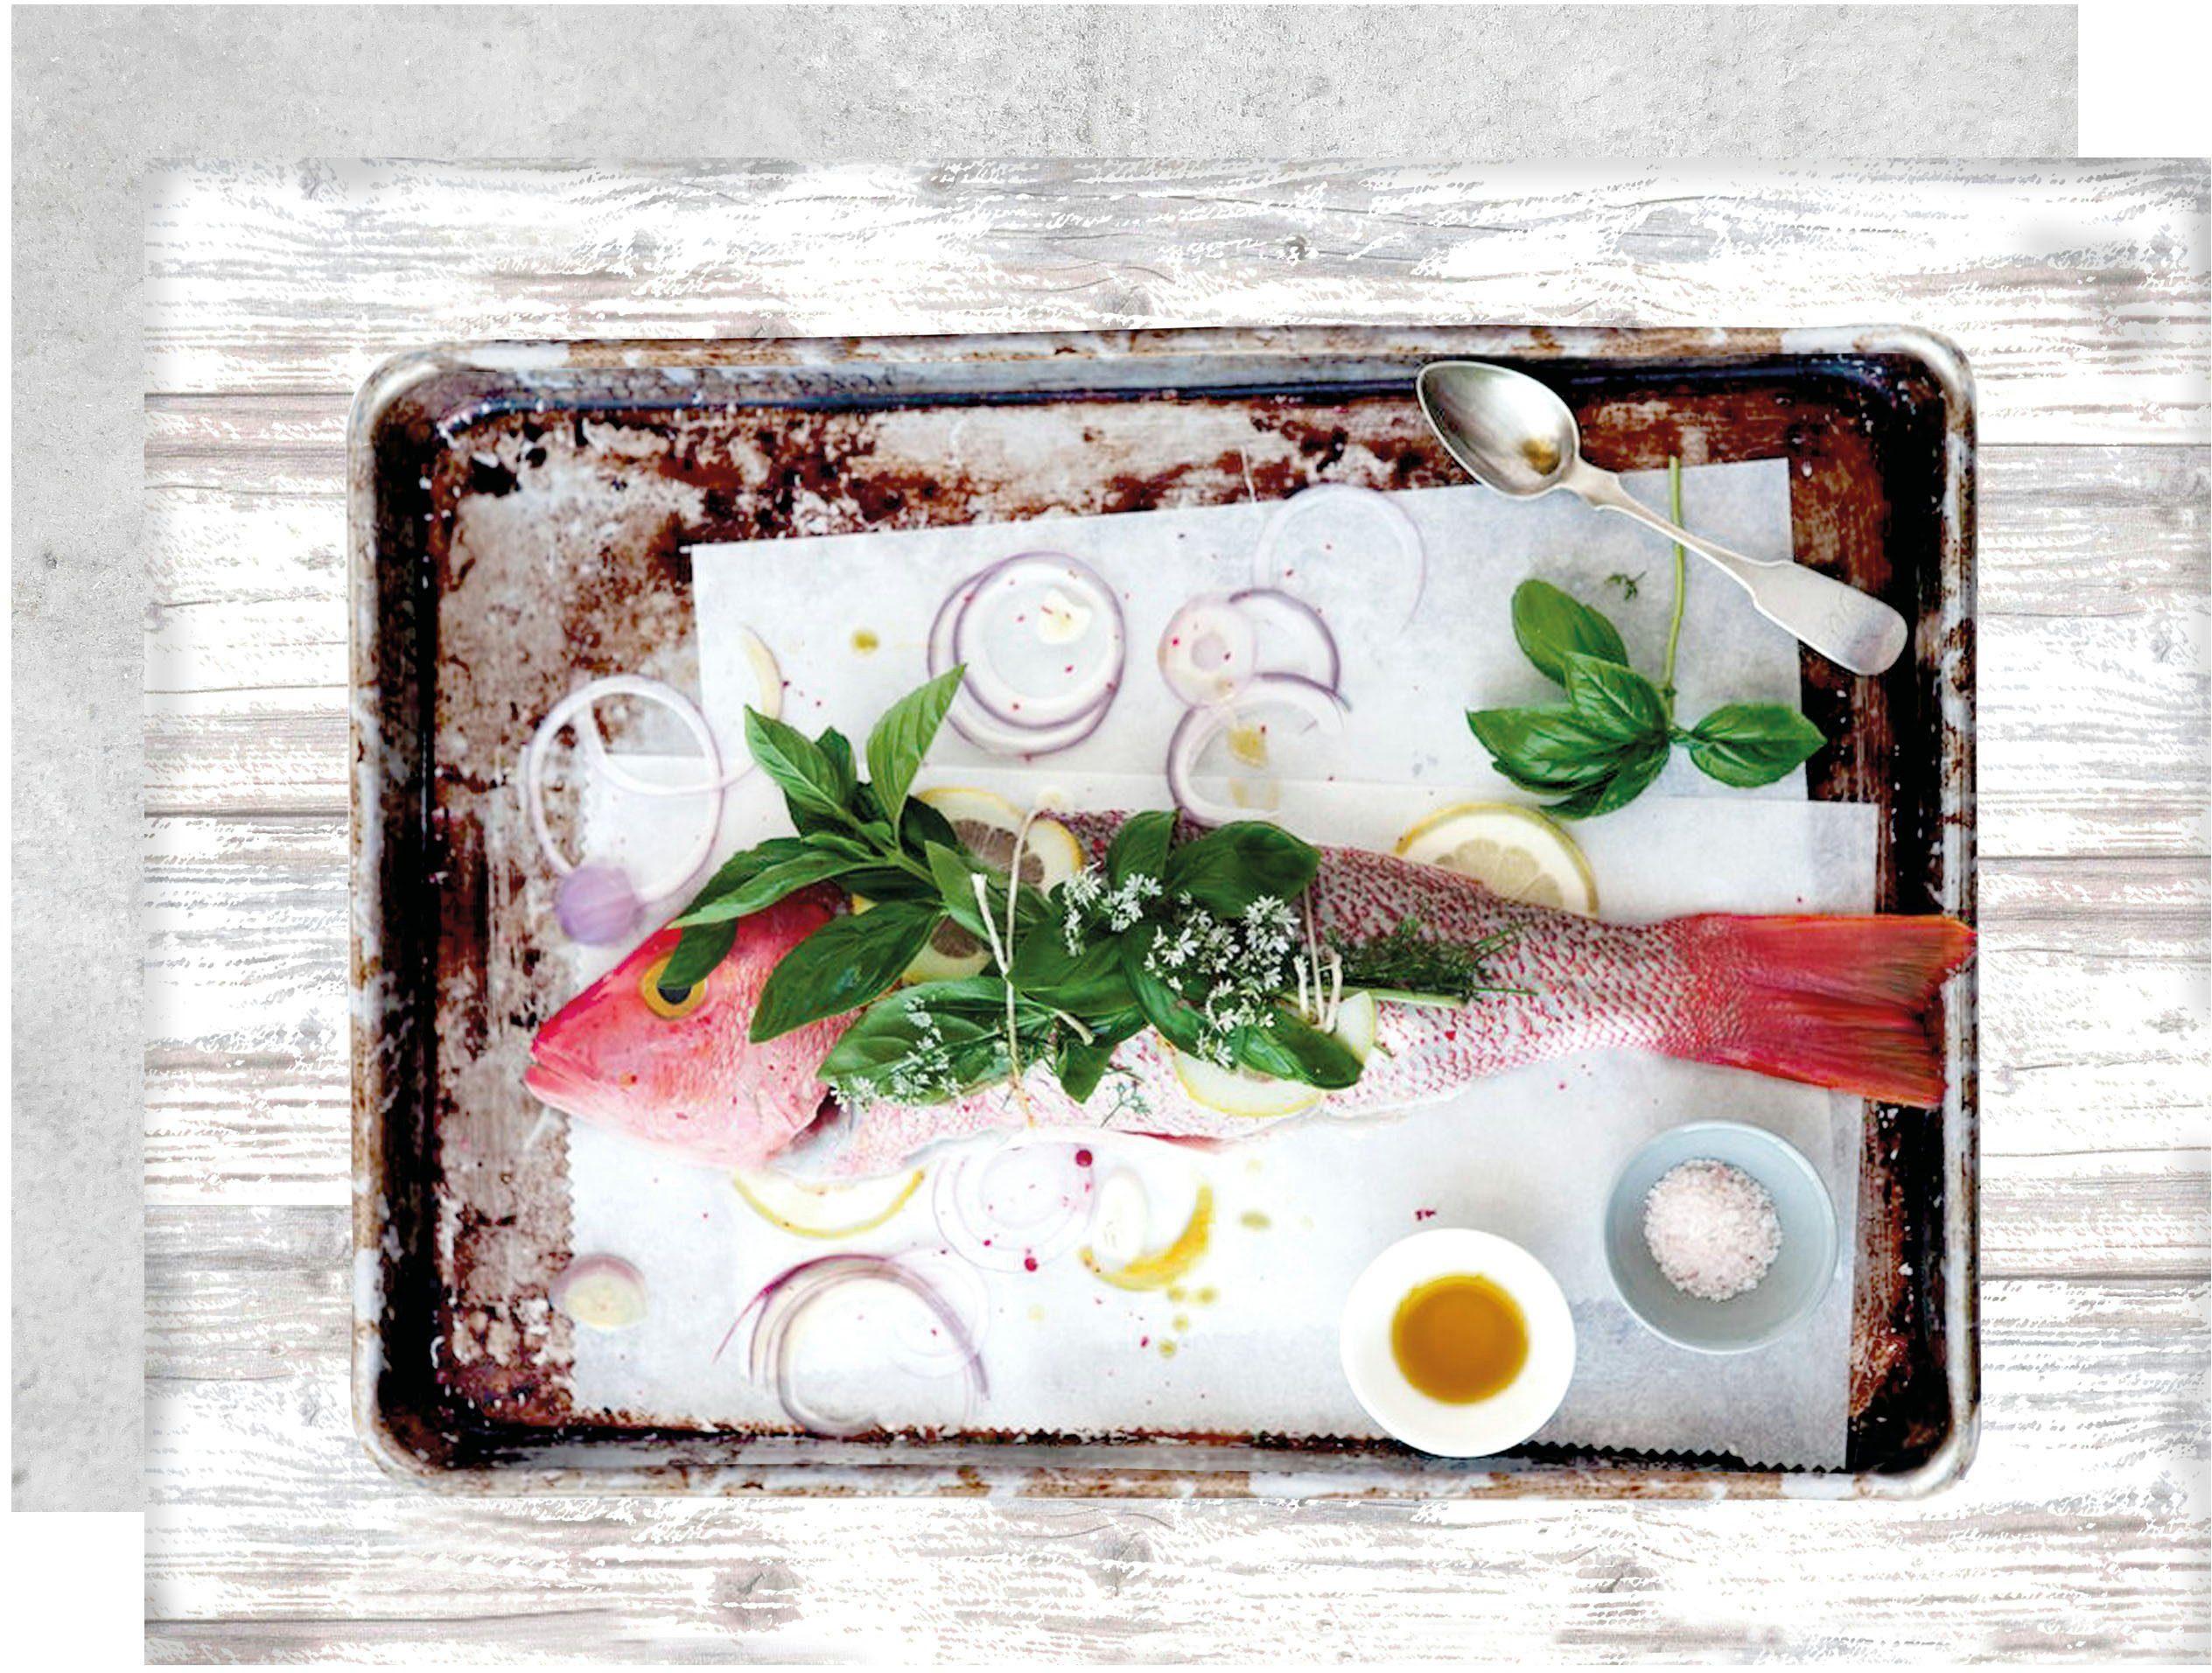 Apelt Platzset, 35x48 cm, »3955 DELIKATESSEN« (4 Stck.), Motiv »Fisch«